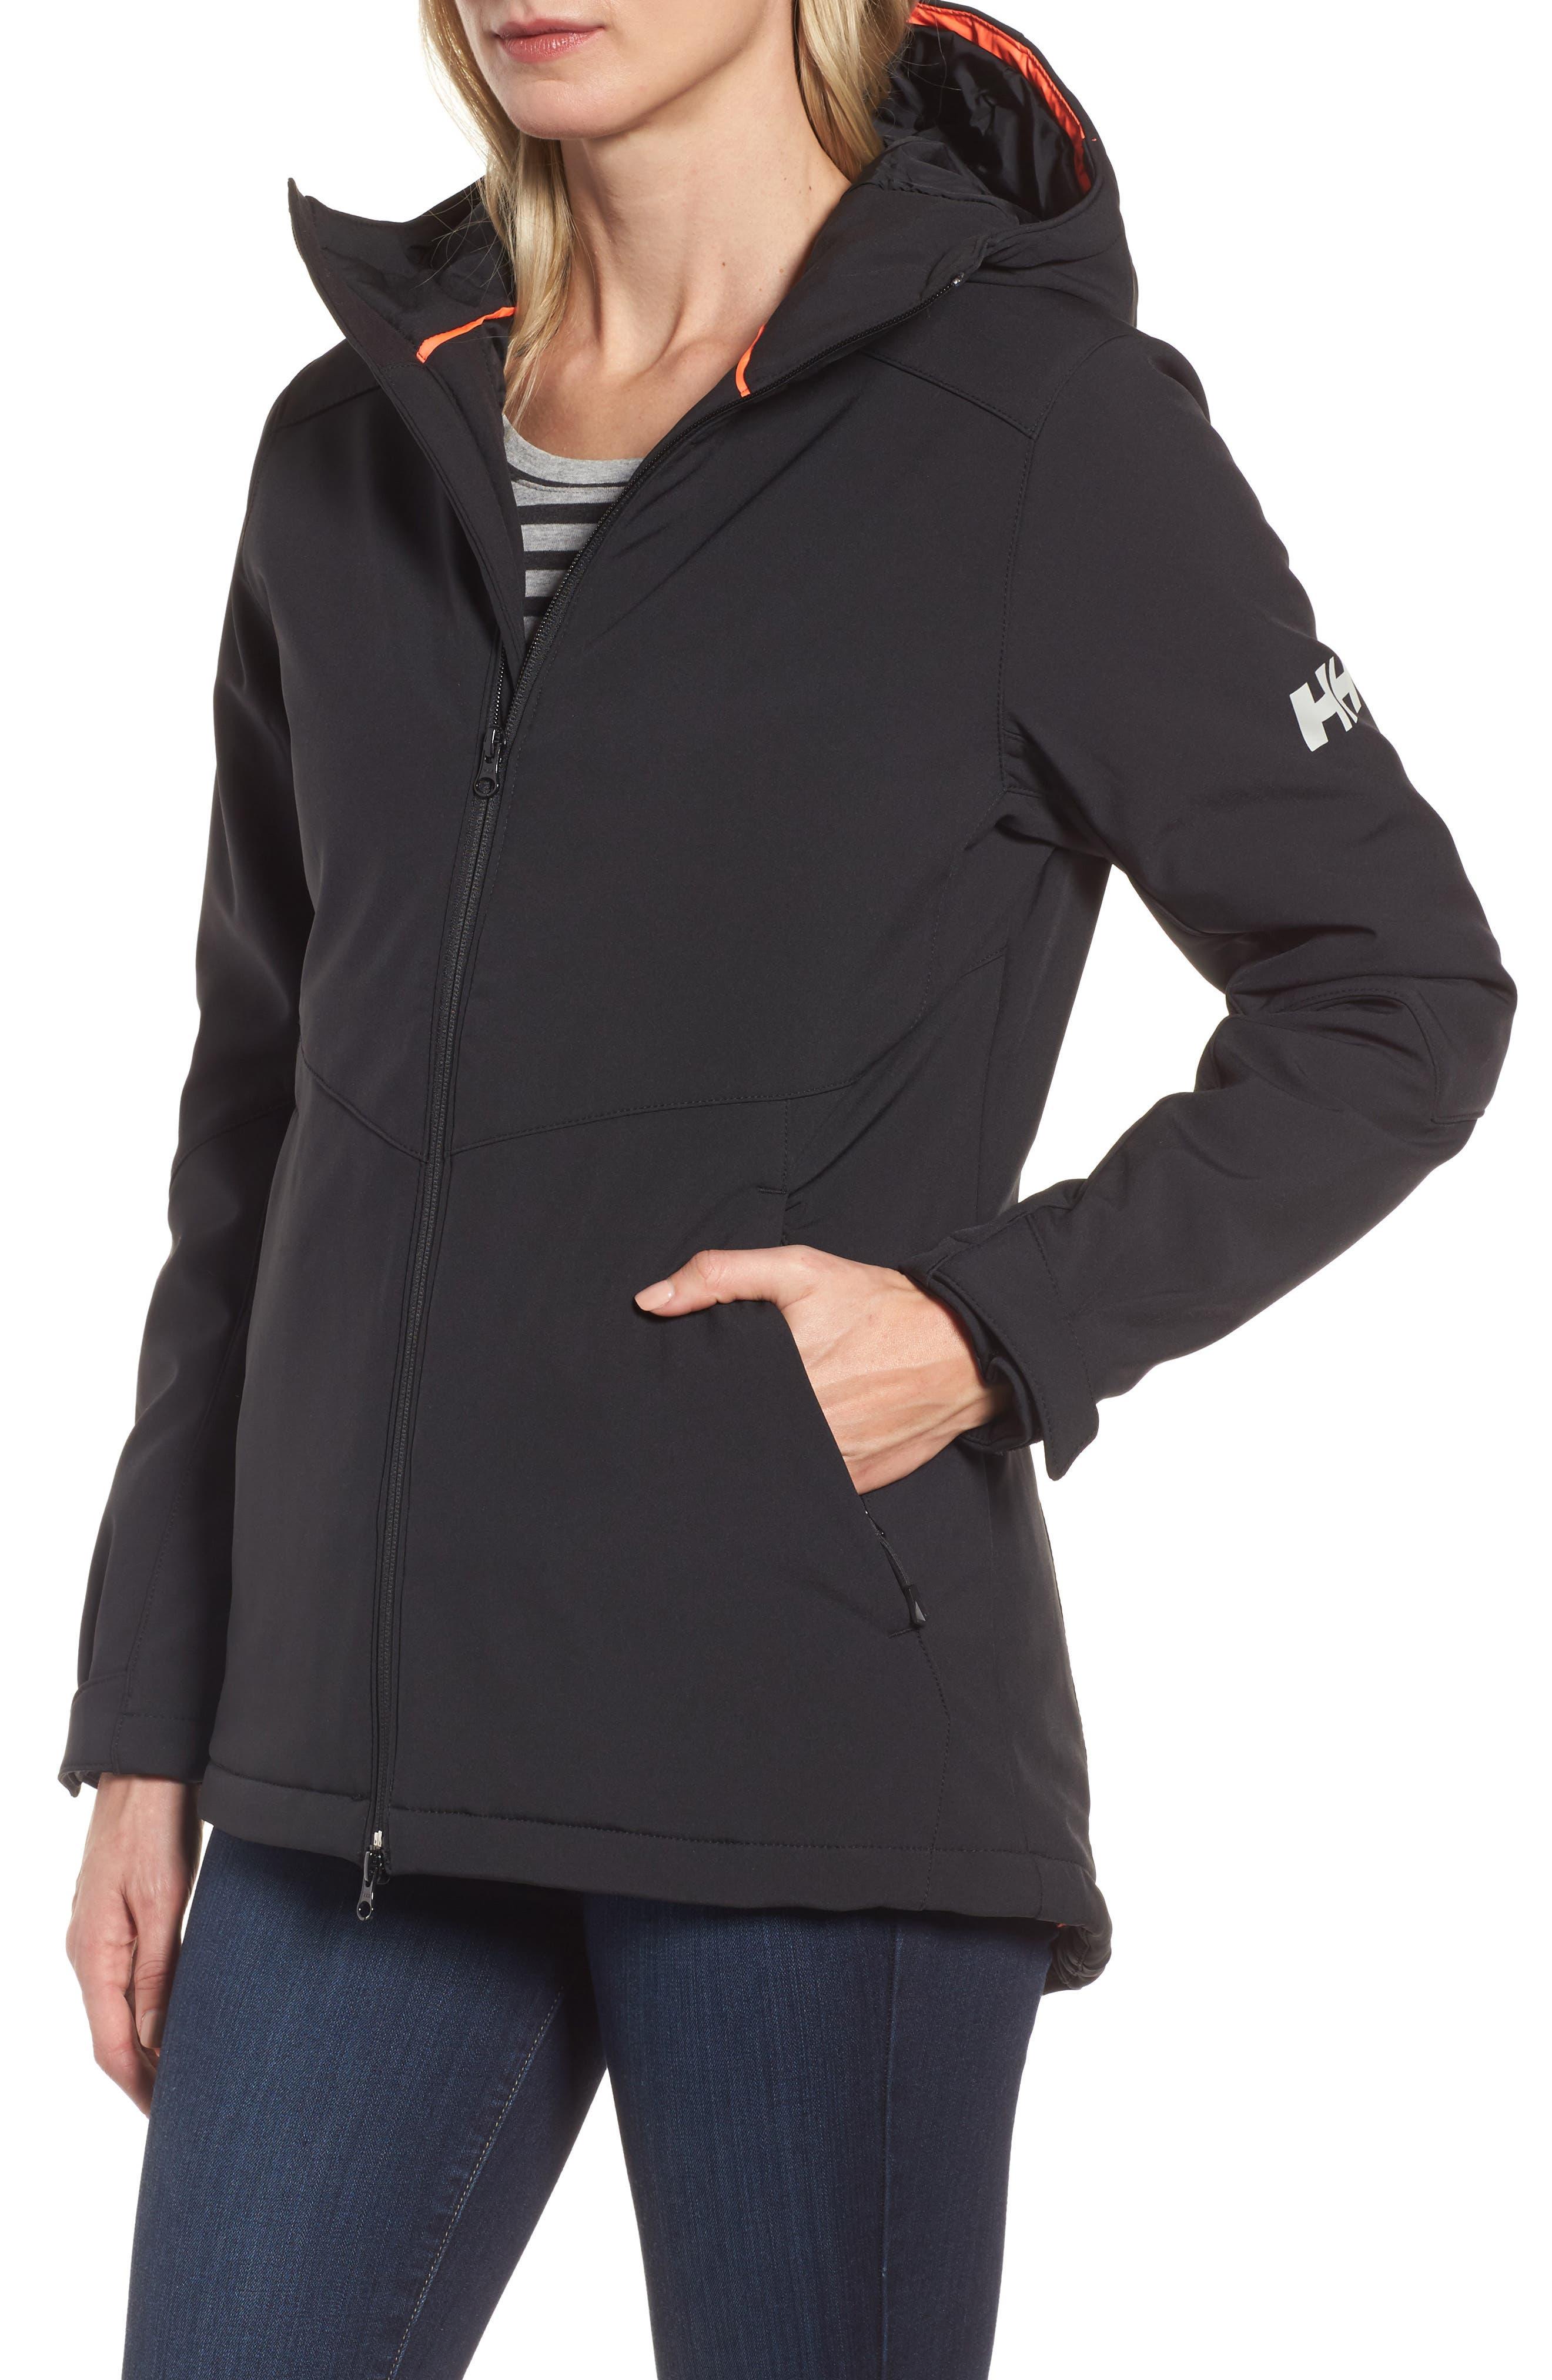 Lofn Hooded Insulated Soft Shell Jacket,                             Alternate thumbnail 4, color,                             Black